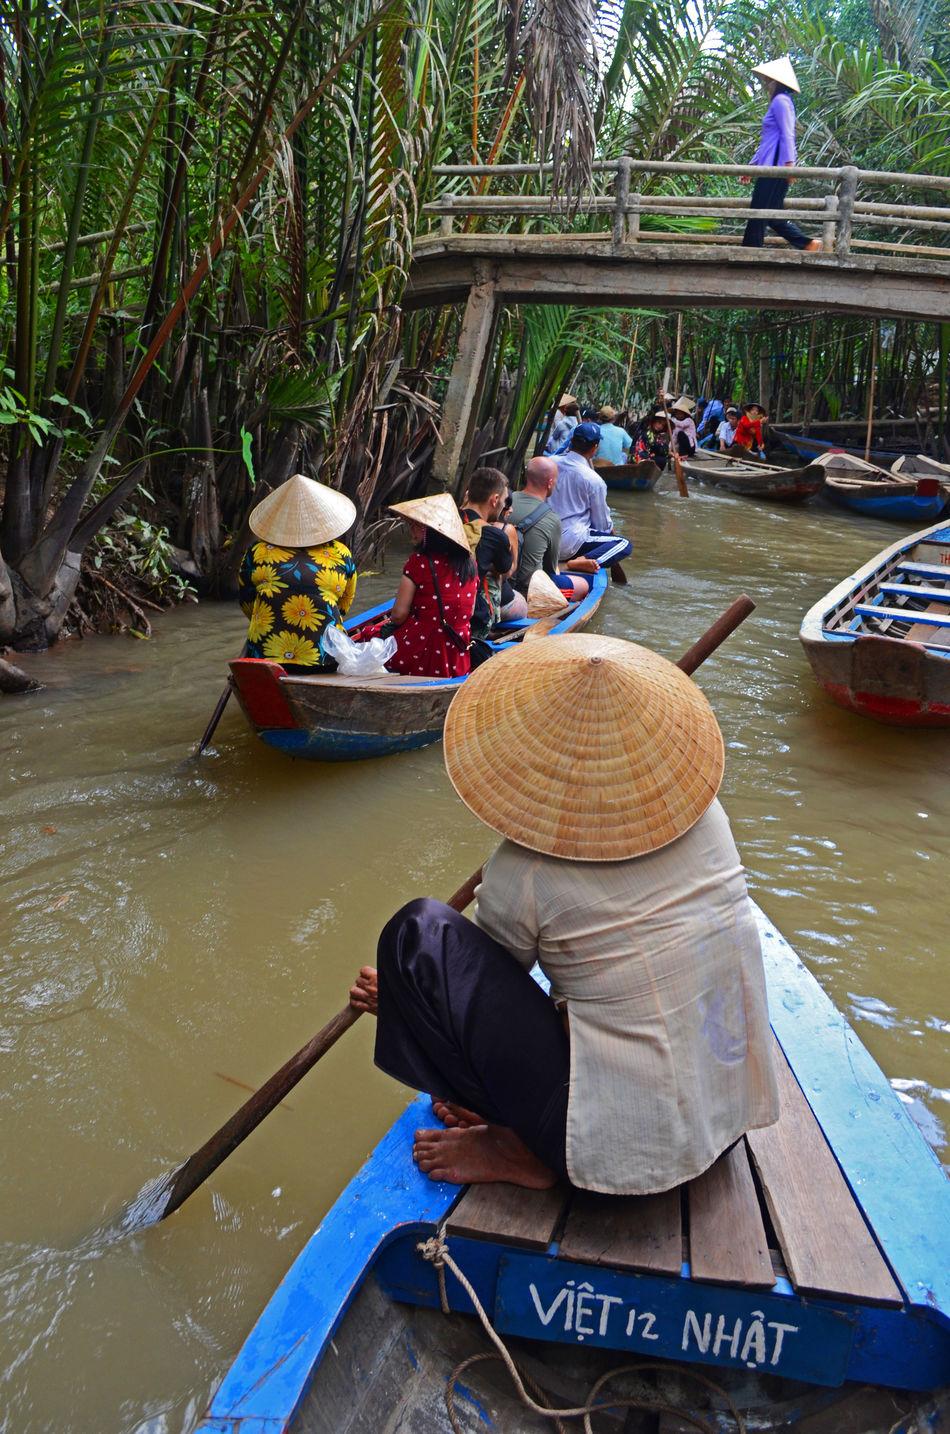 Asian Culture Bridge Canoe Hat Lifestyles Mekong Delta Mekong River Modeoftransport Real People Rowing Tradition Woman Women